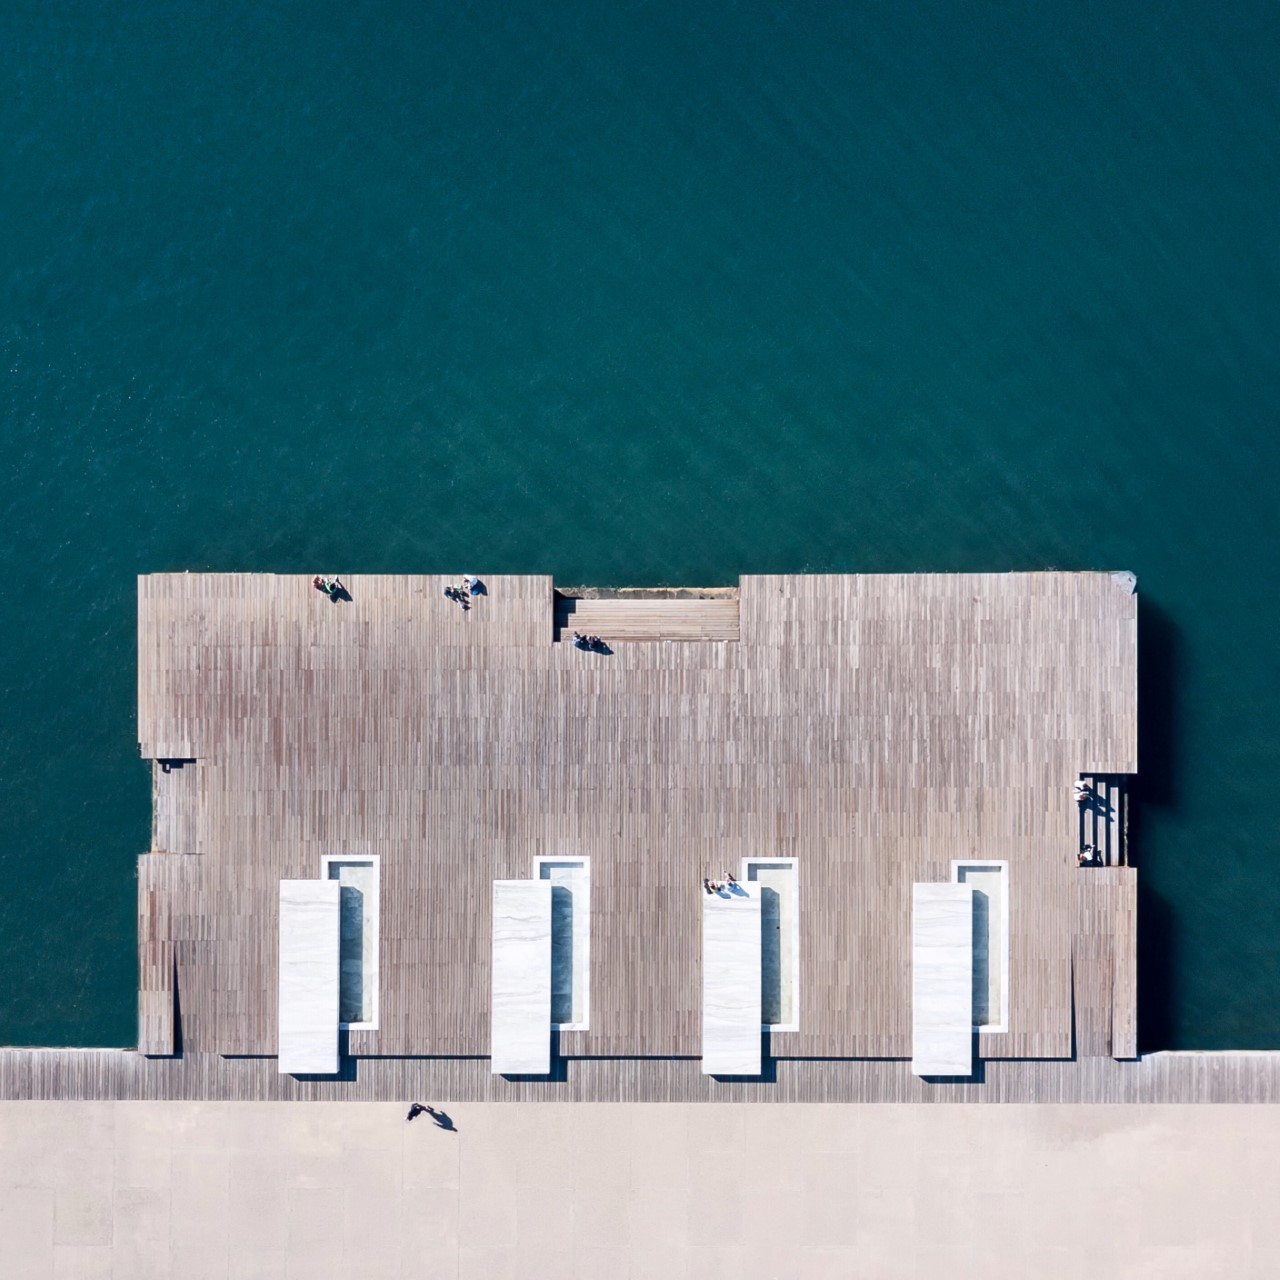 thessaloniki-drone-04.jpg